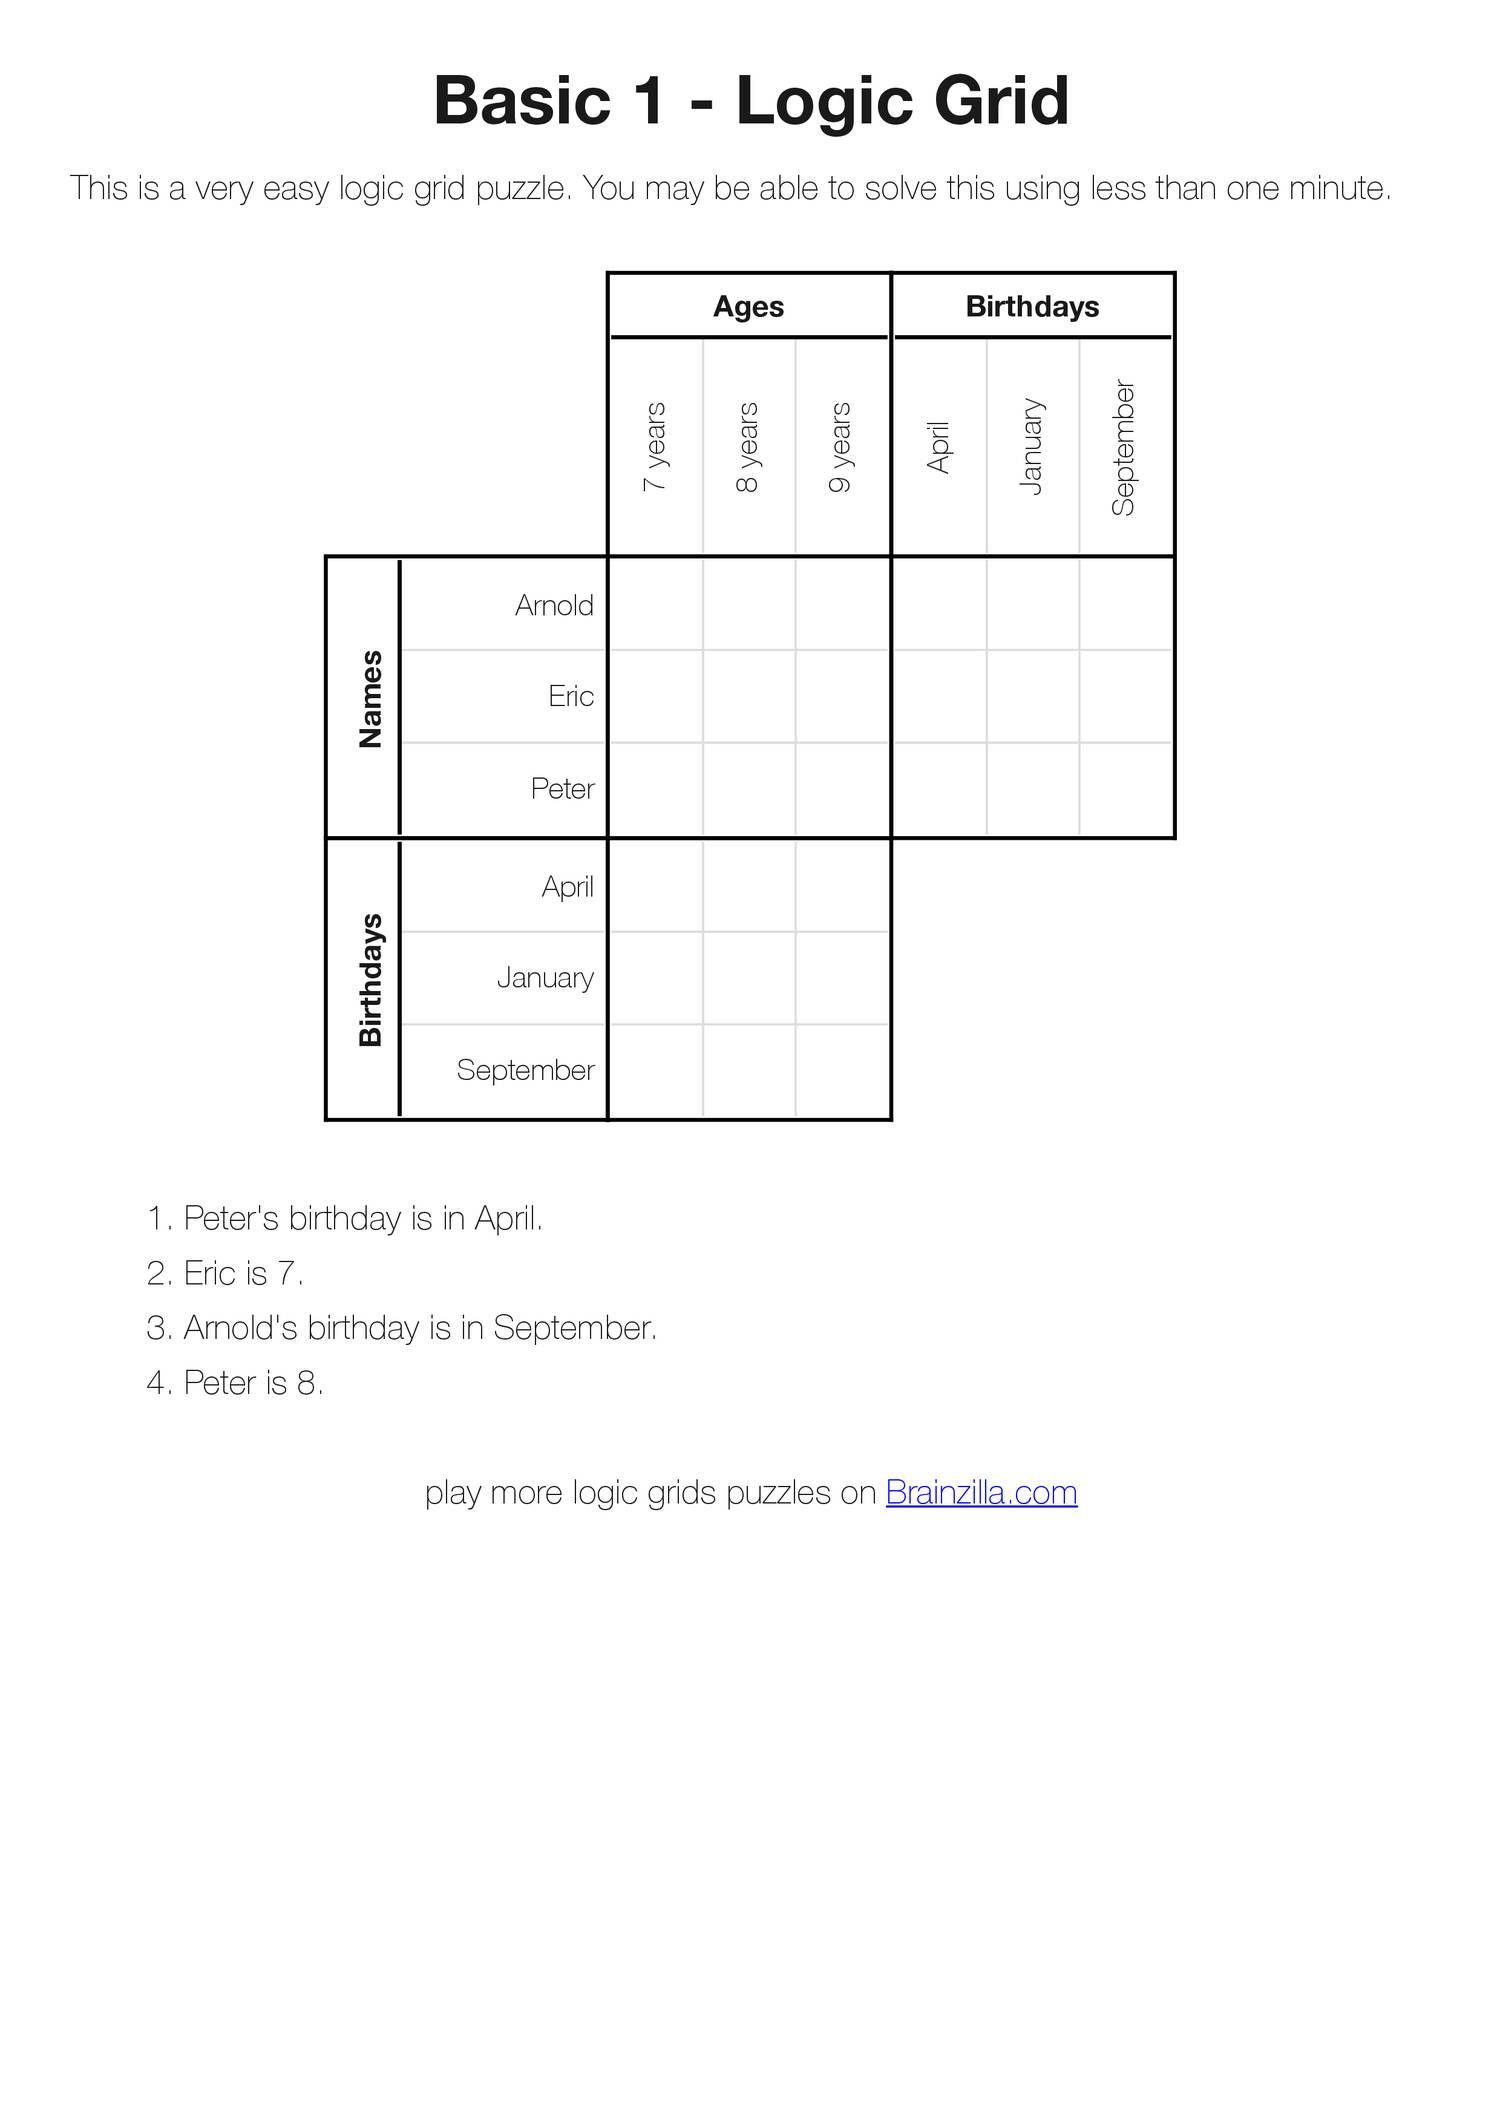 Printable Logic Grid Puzzles (Brainzilla).pdf | Docdroid - Printable Logic Puzzles Pdf